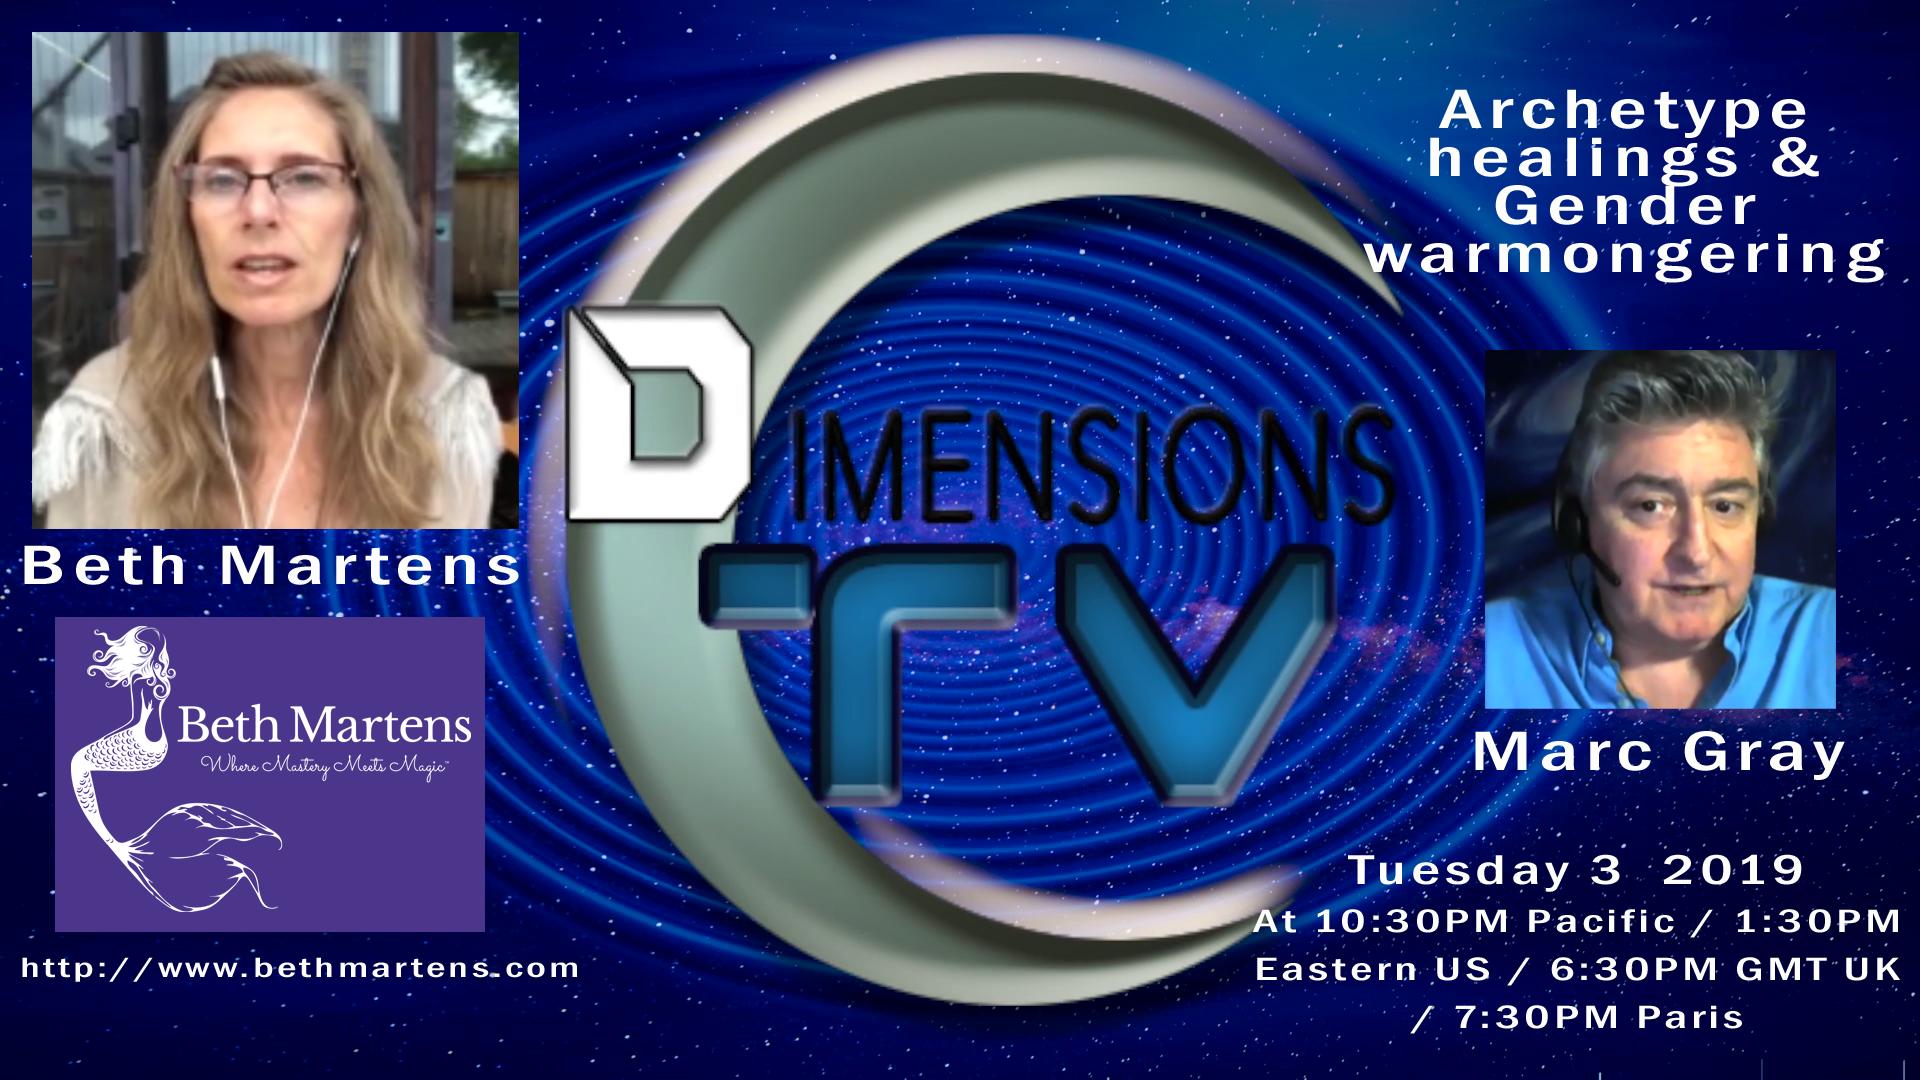 Beth Martens DTV